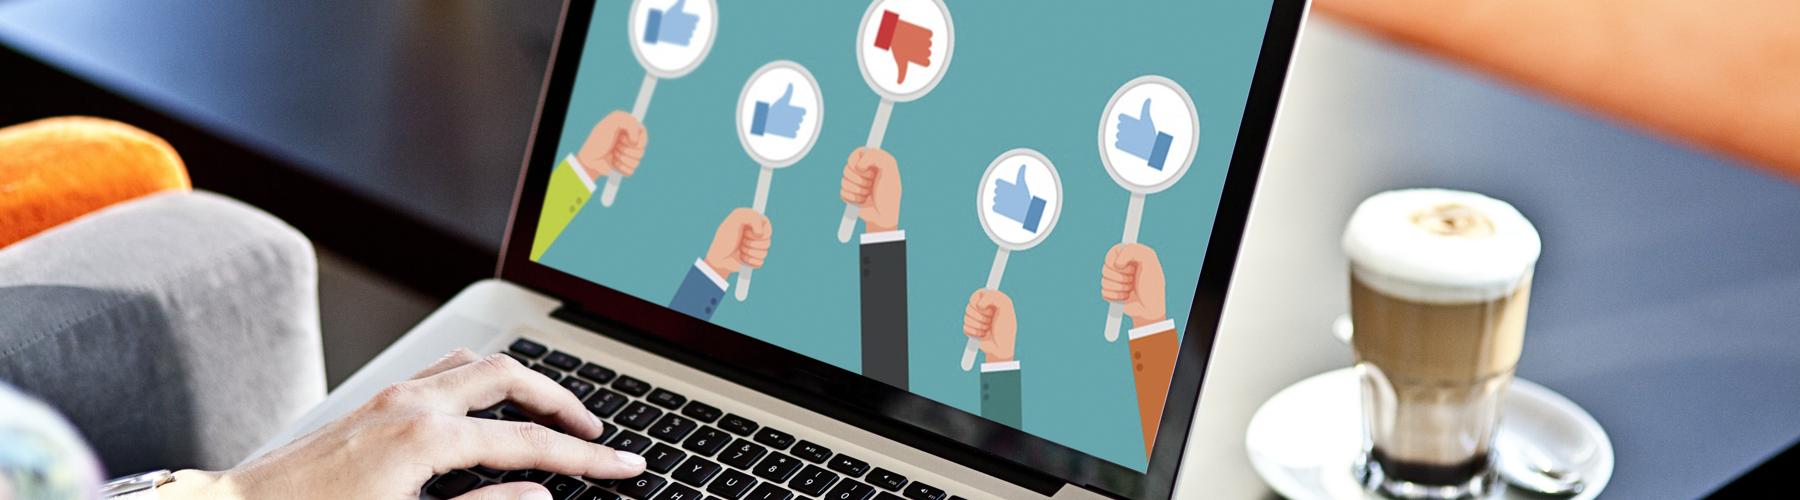 Your Social Media Customer Service Power